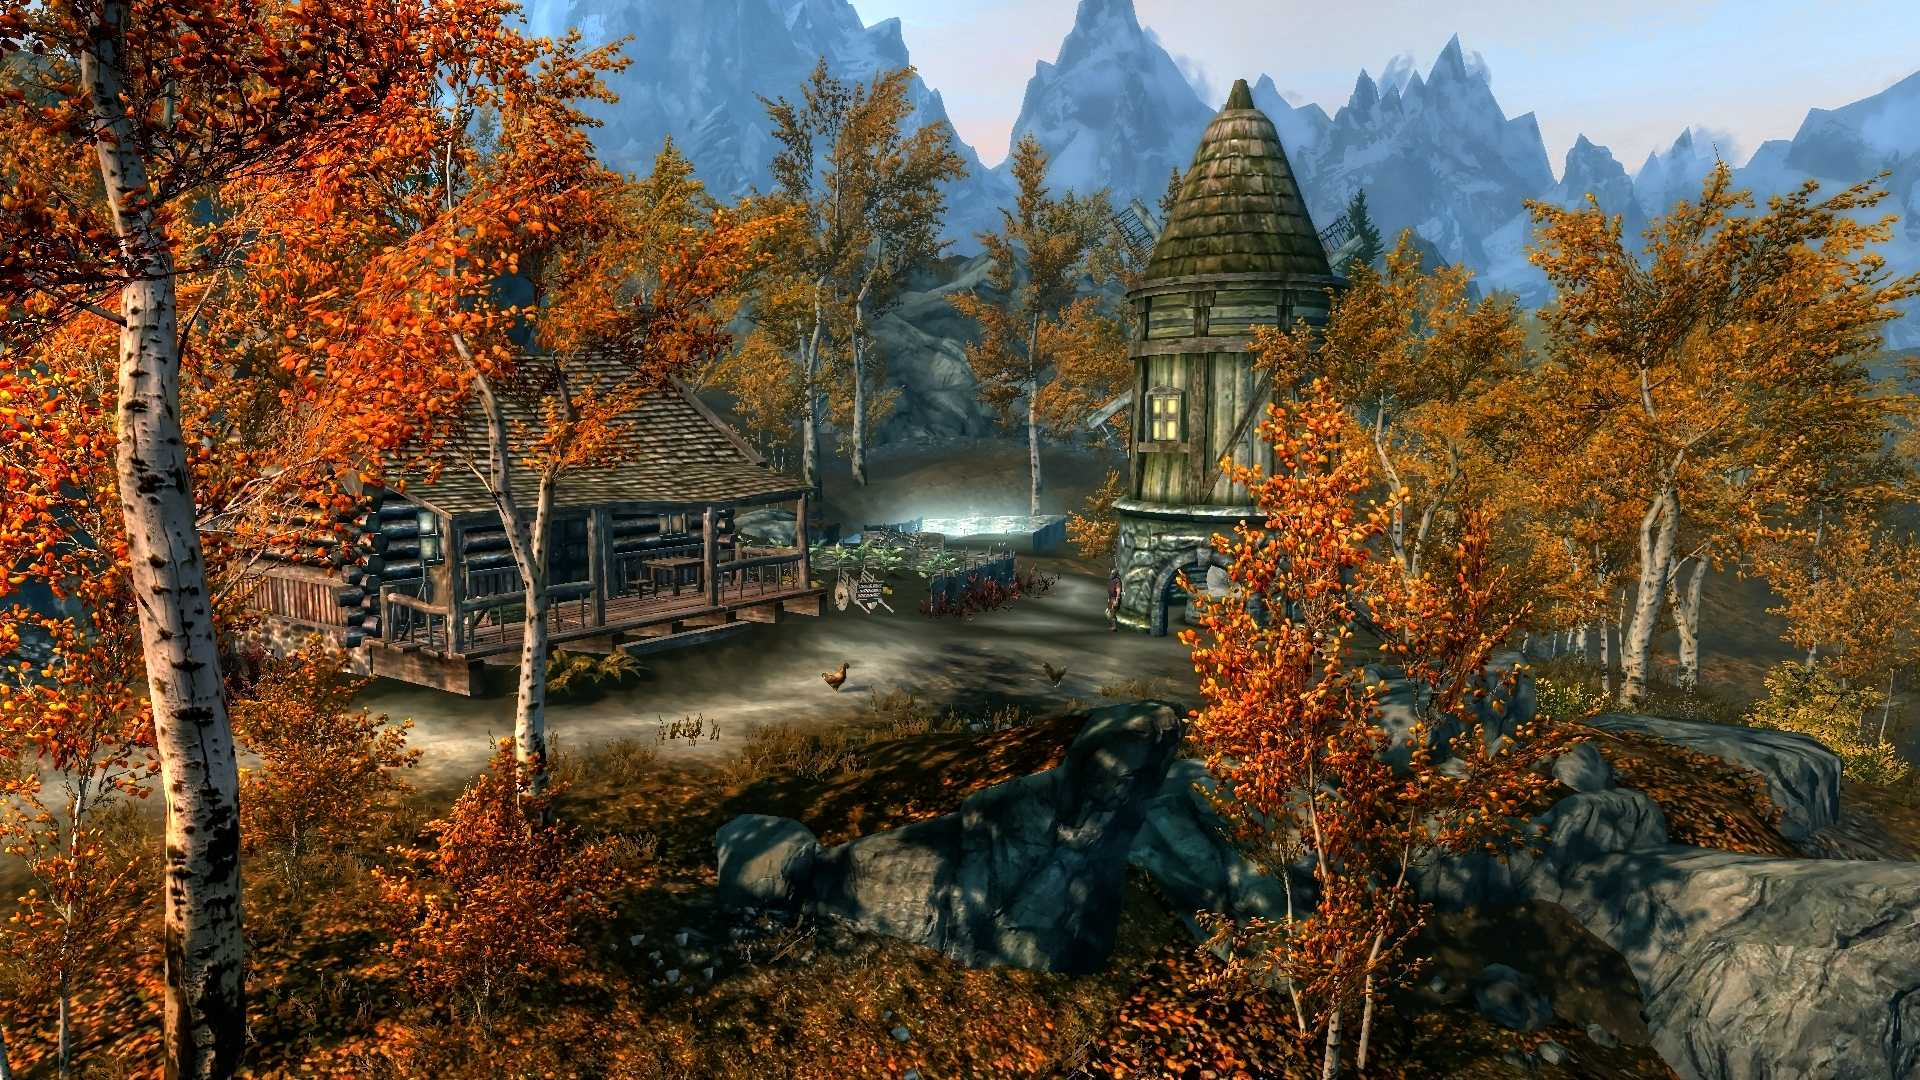 Fall Scene Desktop Wallpaper The Elder Scrolls V Skyrim Full Hd Обои And Фон